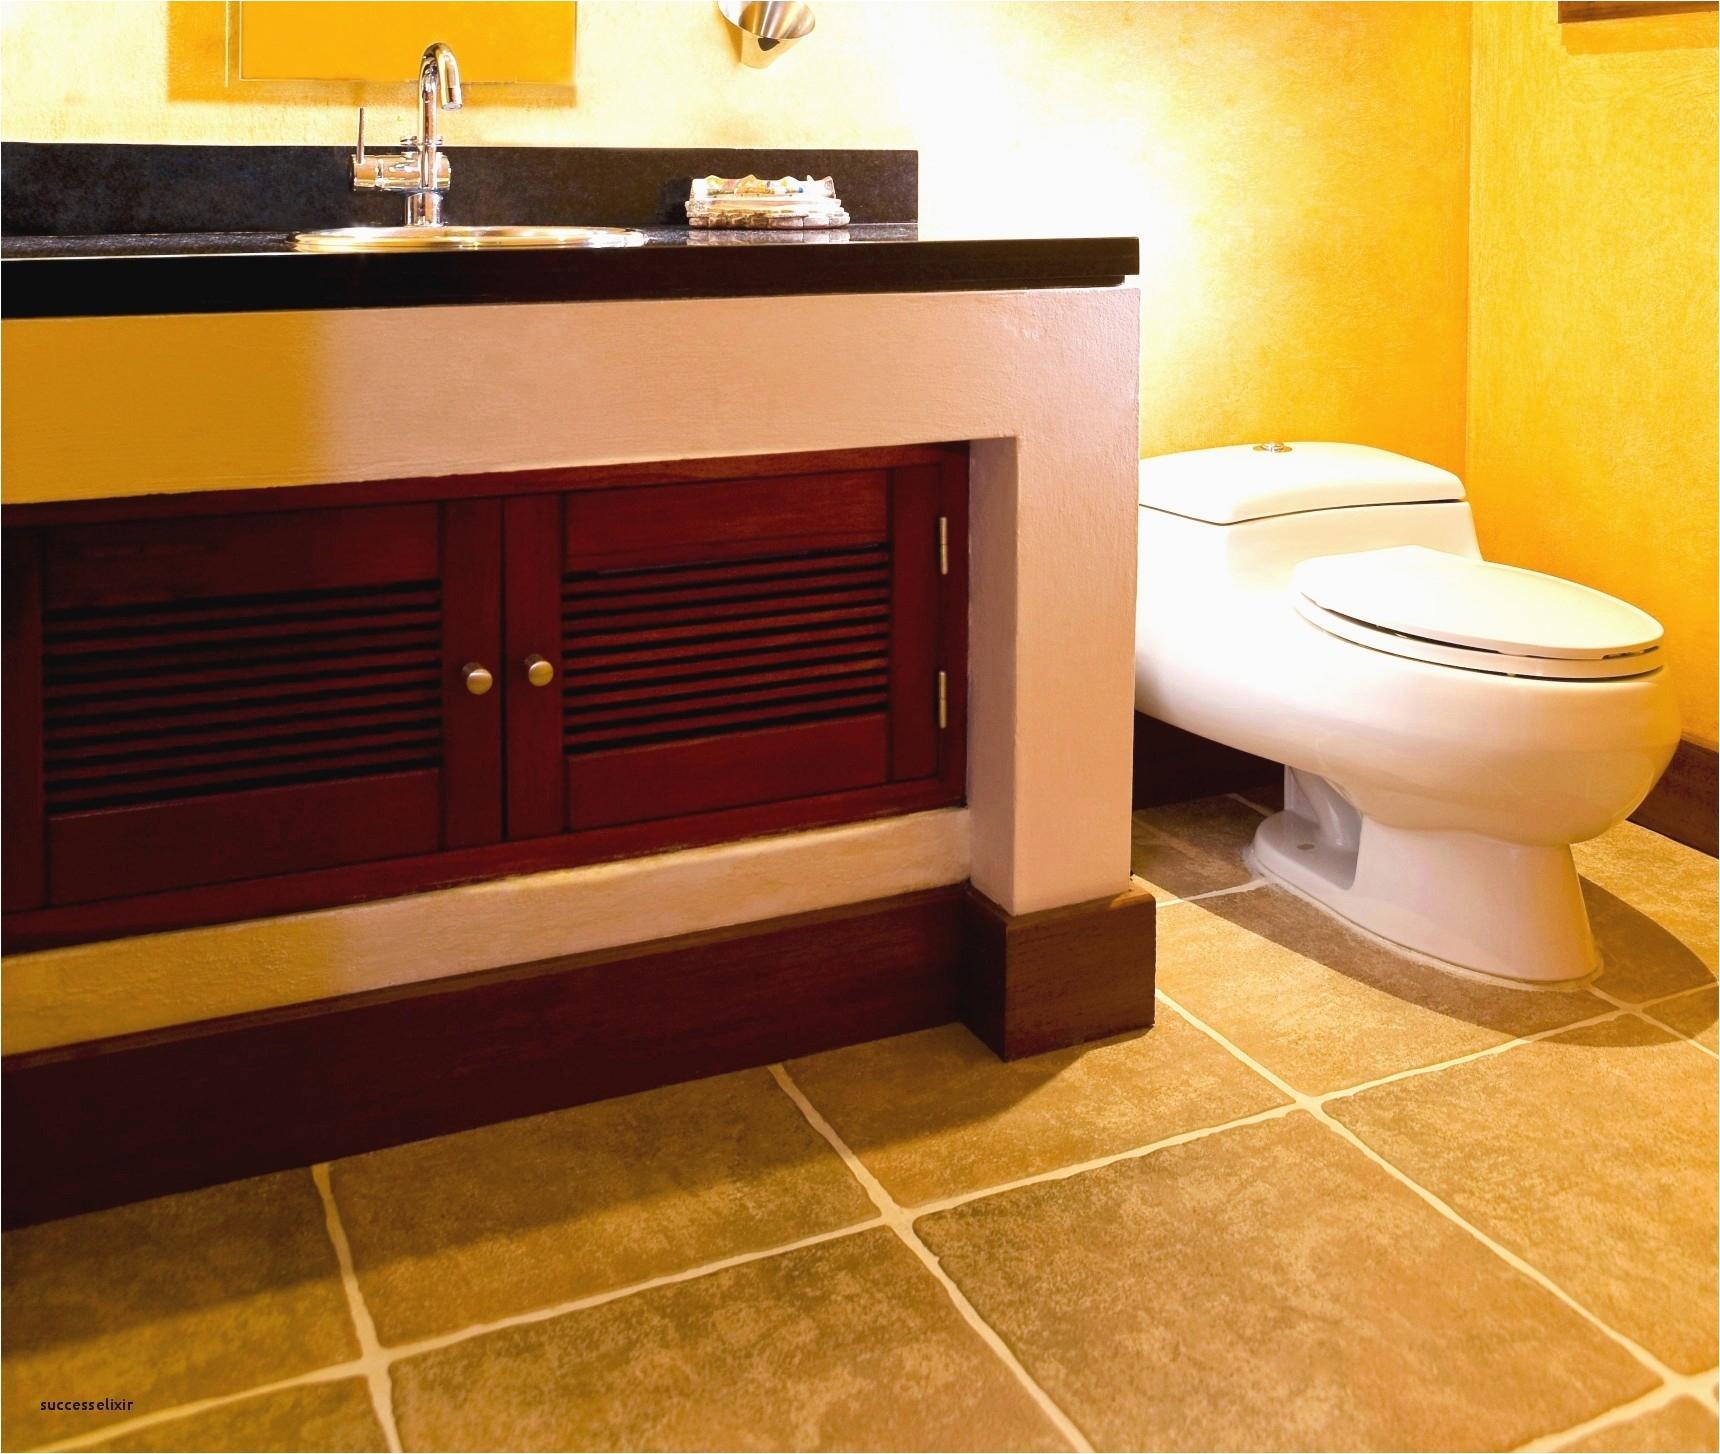 glass tile bathroom fresh floor tiles mosaic bathroom 0d new bathroom floor tiles home